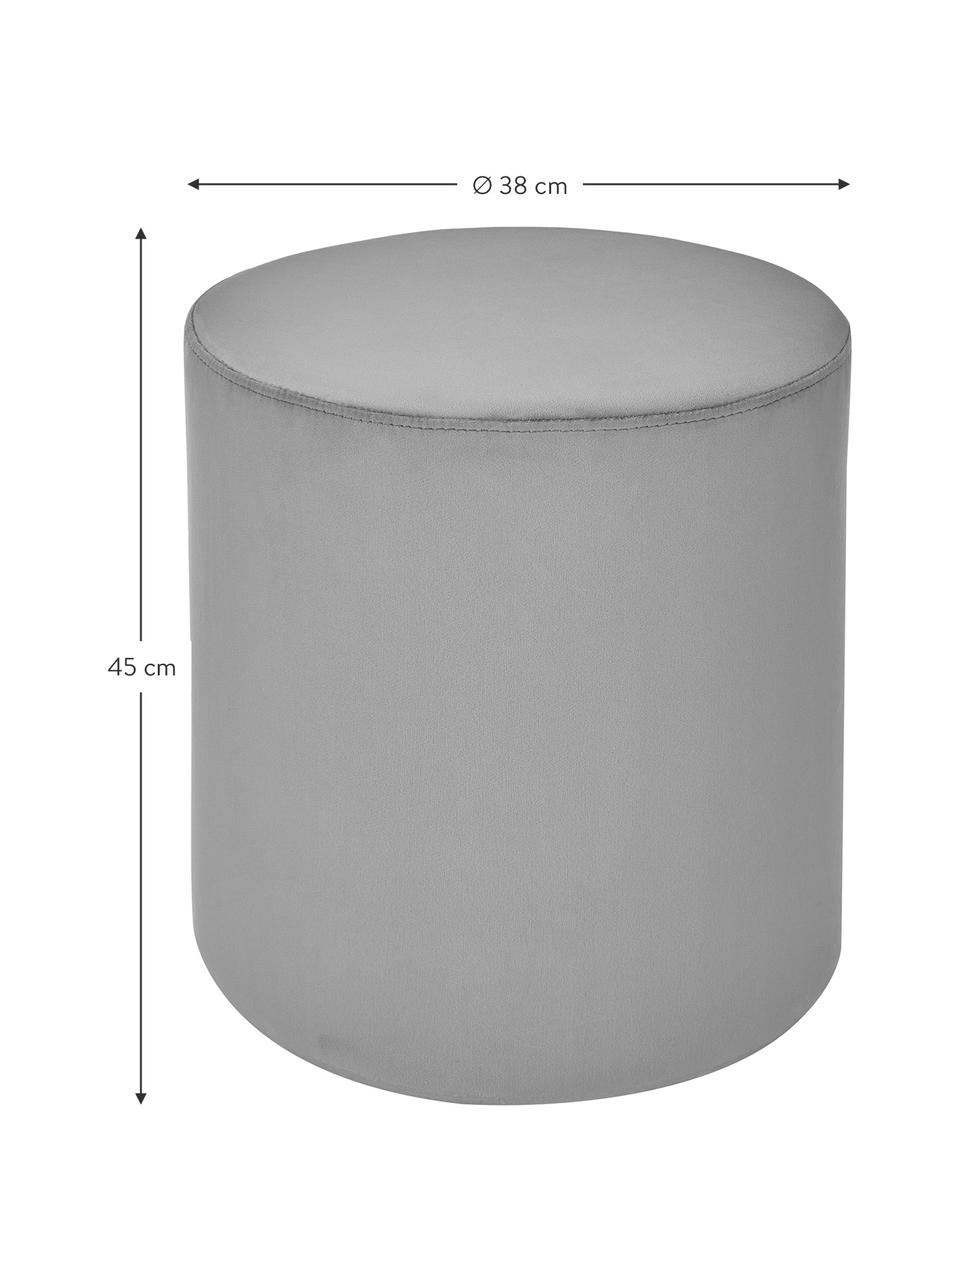 Samt-Hocker Daisy in Grau, Bezug: Samt (Polyester) Der hoch, Rahmen: Sperrholz, Samt Grau, Ø 38 x H 45 cm